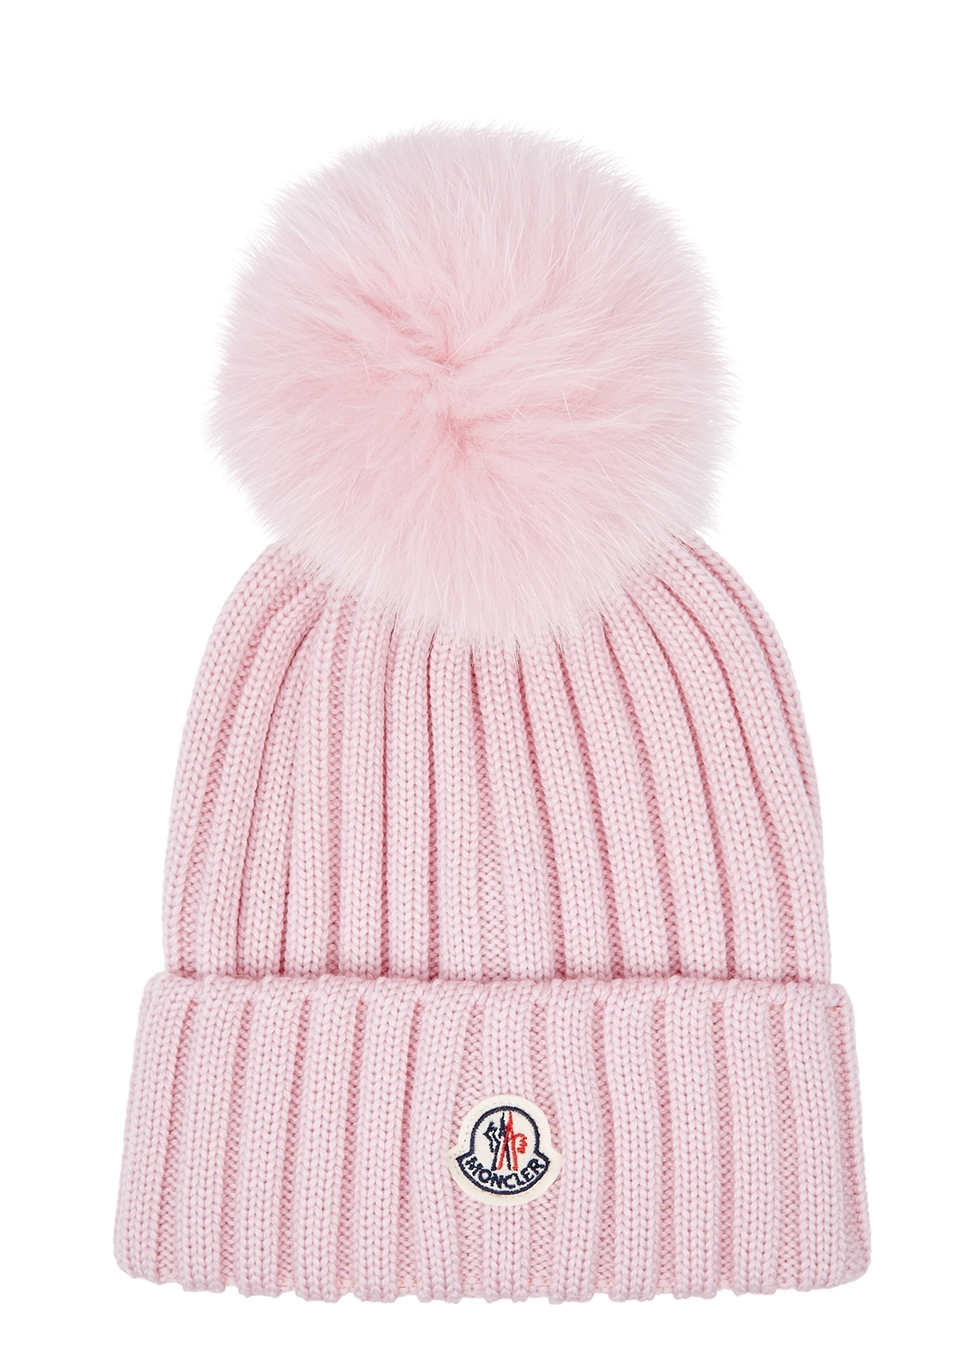 3a9429b8bbc Designer Beanies - Women s Luxury Hats - Harvey Nichols